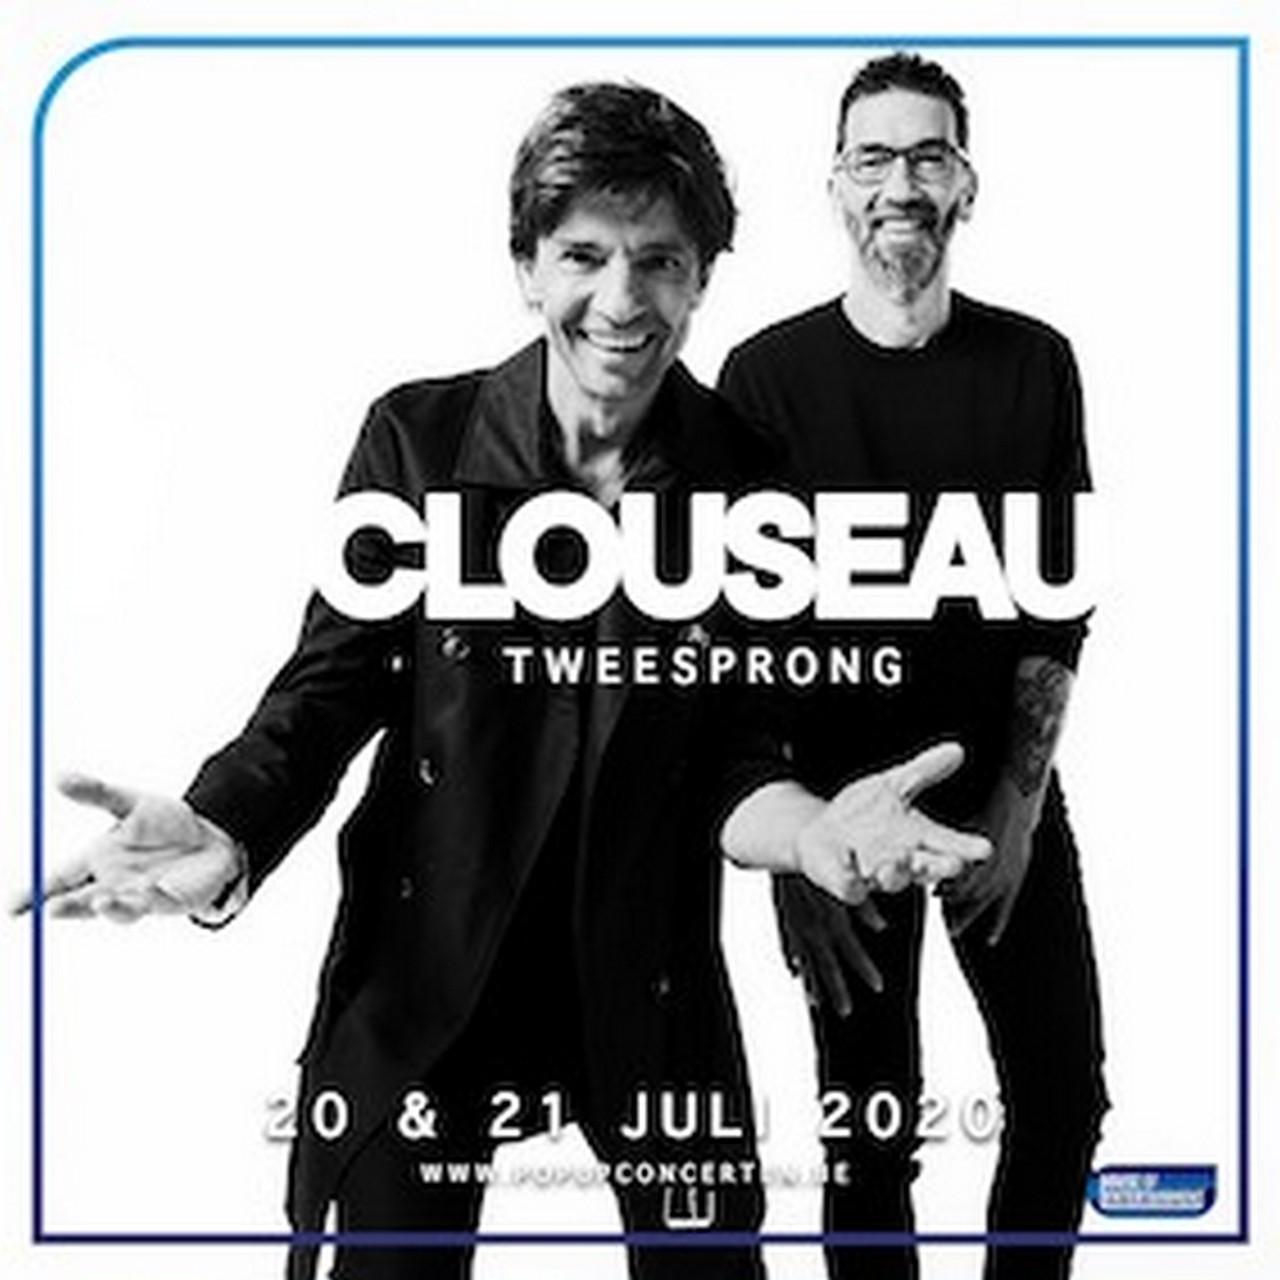 House of Entertainment pakt uit in Studio 100 Pop-Up Theater - Clouseau 20 21 juli